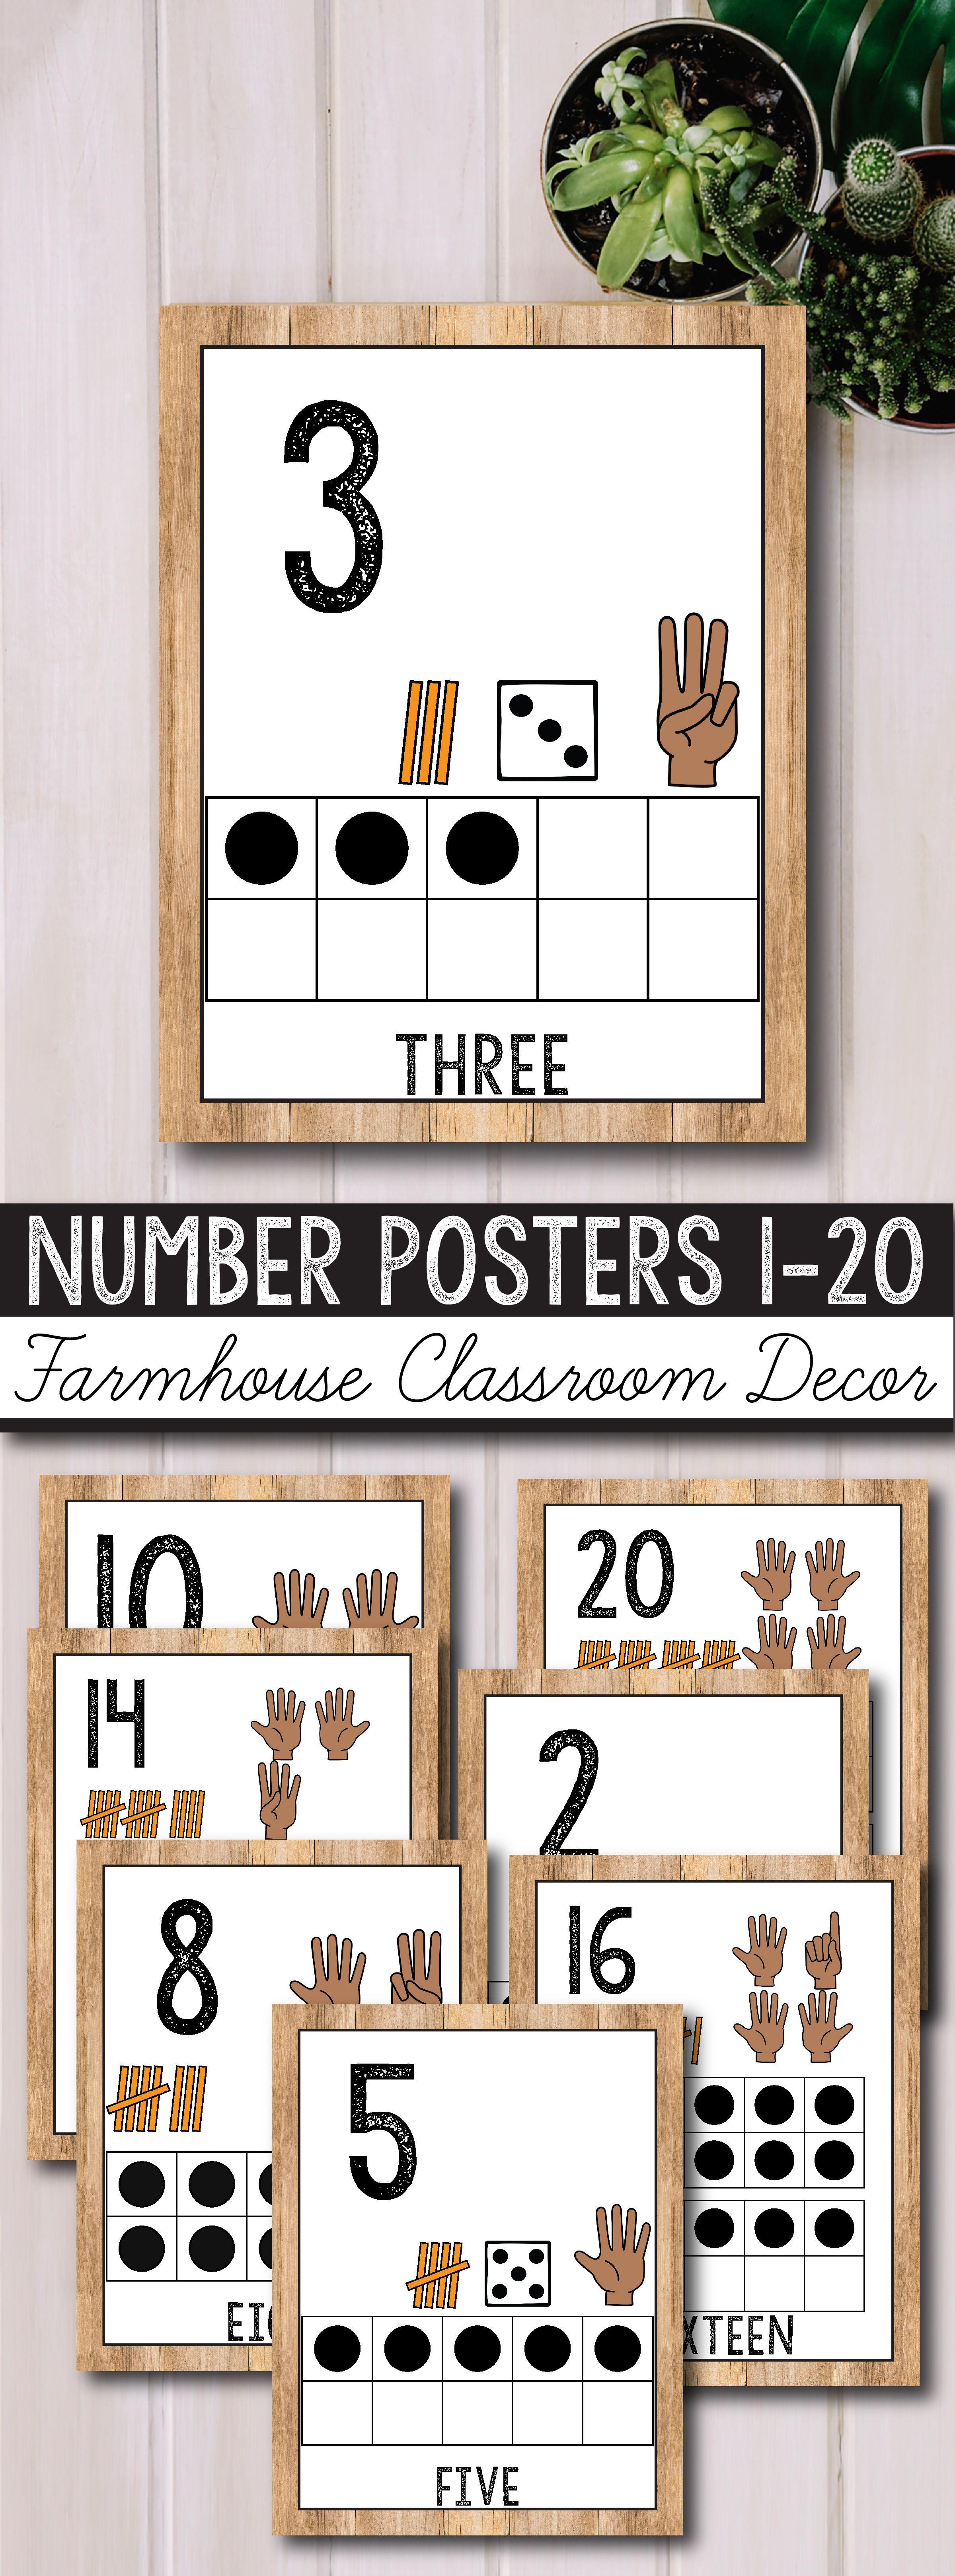 Number Posters 0-20 - Farmhouse Theme, Rustic Classroom Decor #classroomdecor